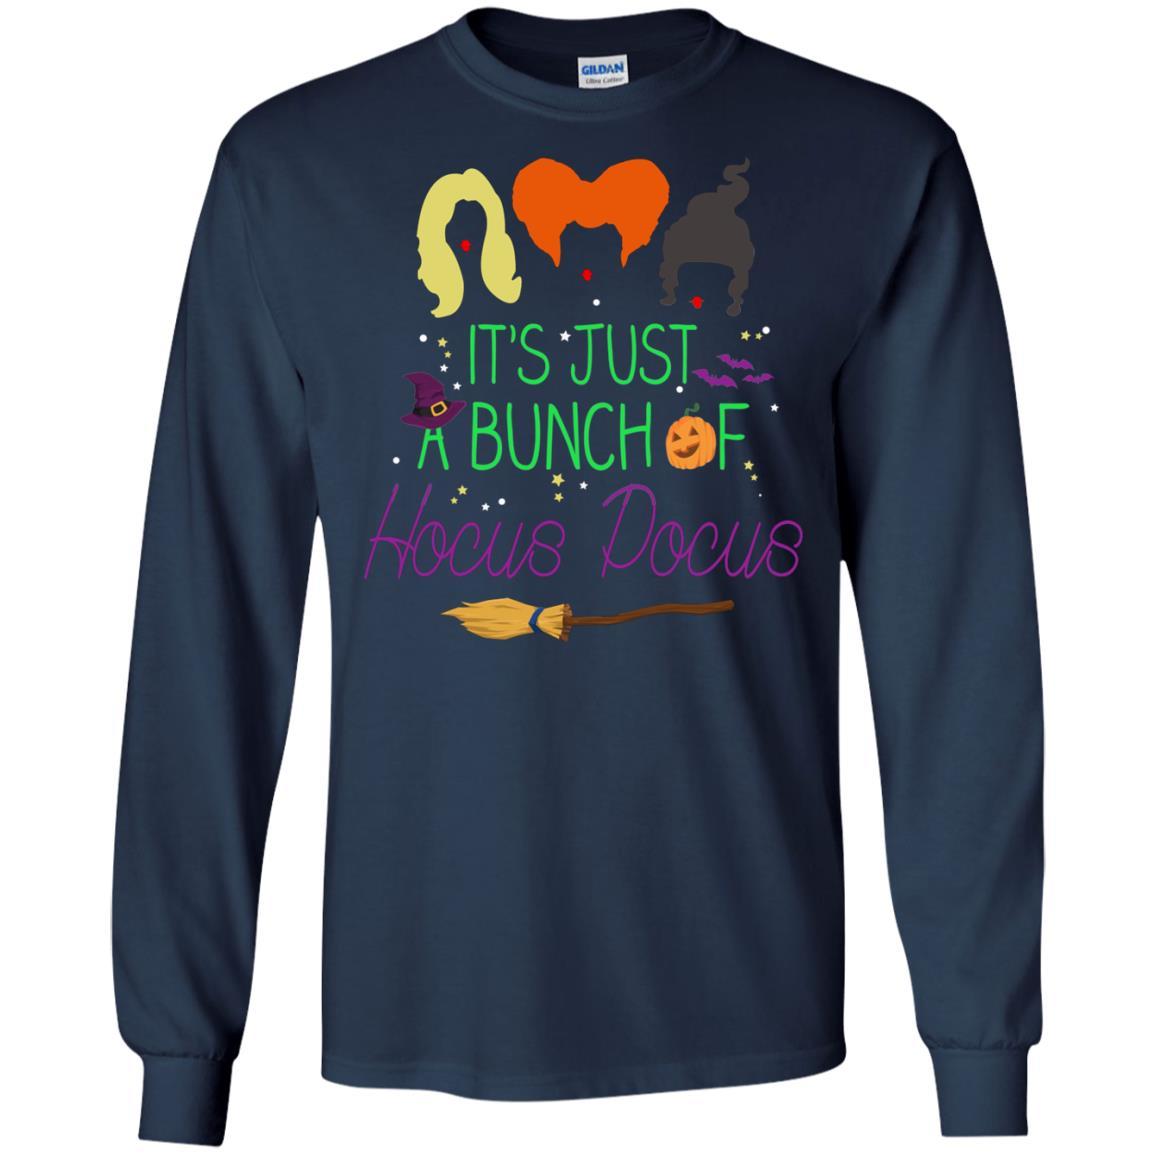 e362d42e It's just a bunch of Hocus Pocus t-shirt, hoodie, ladies tee